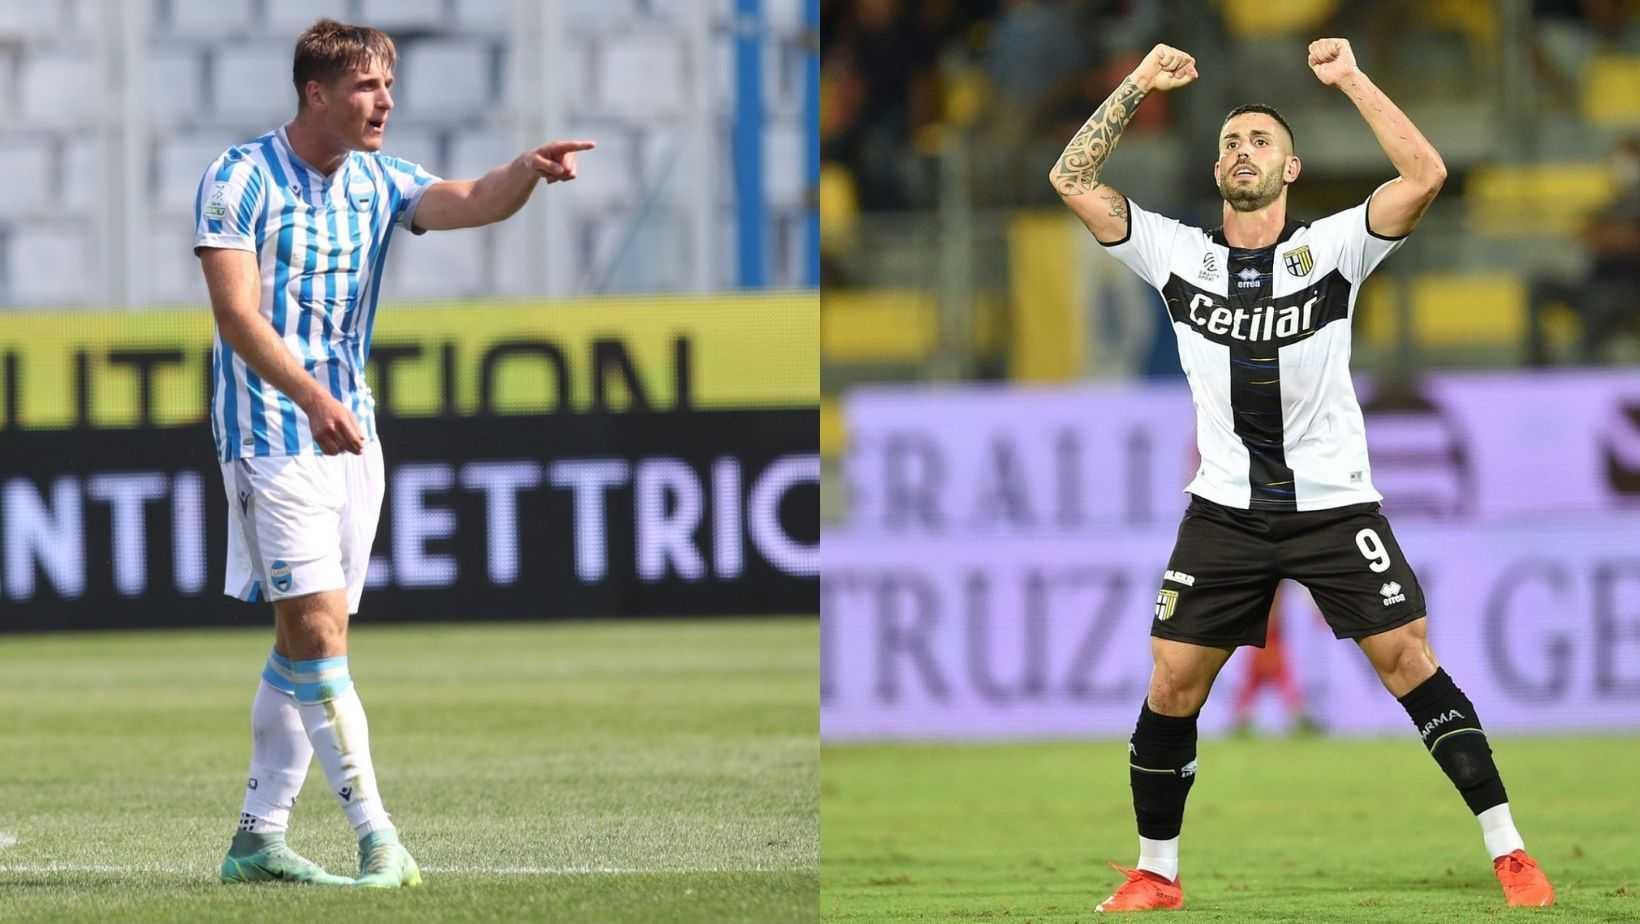 Derby di giornata: da Torino-Juventus a SPAL-Parma